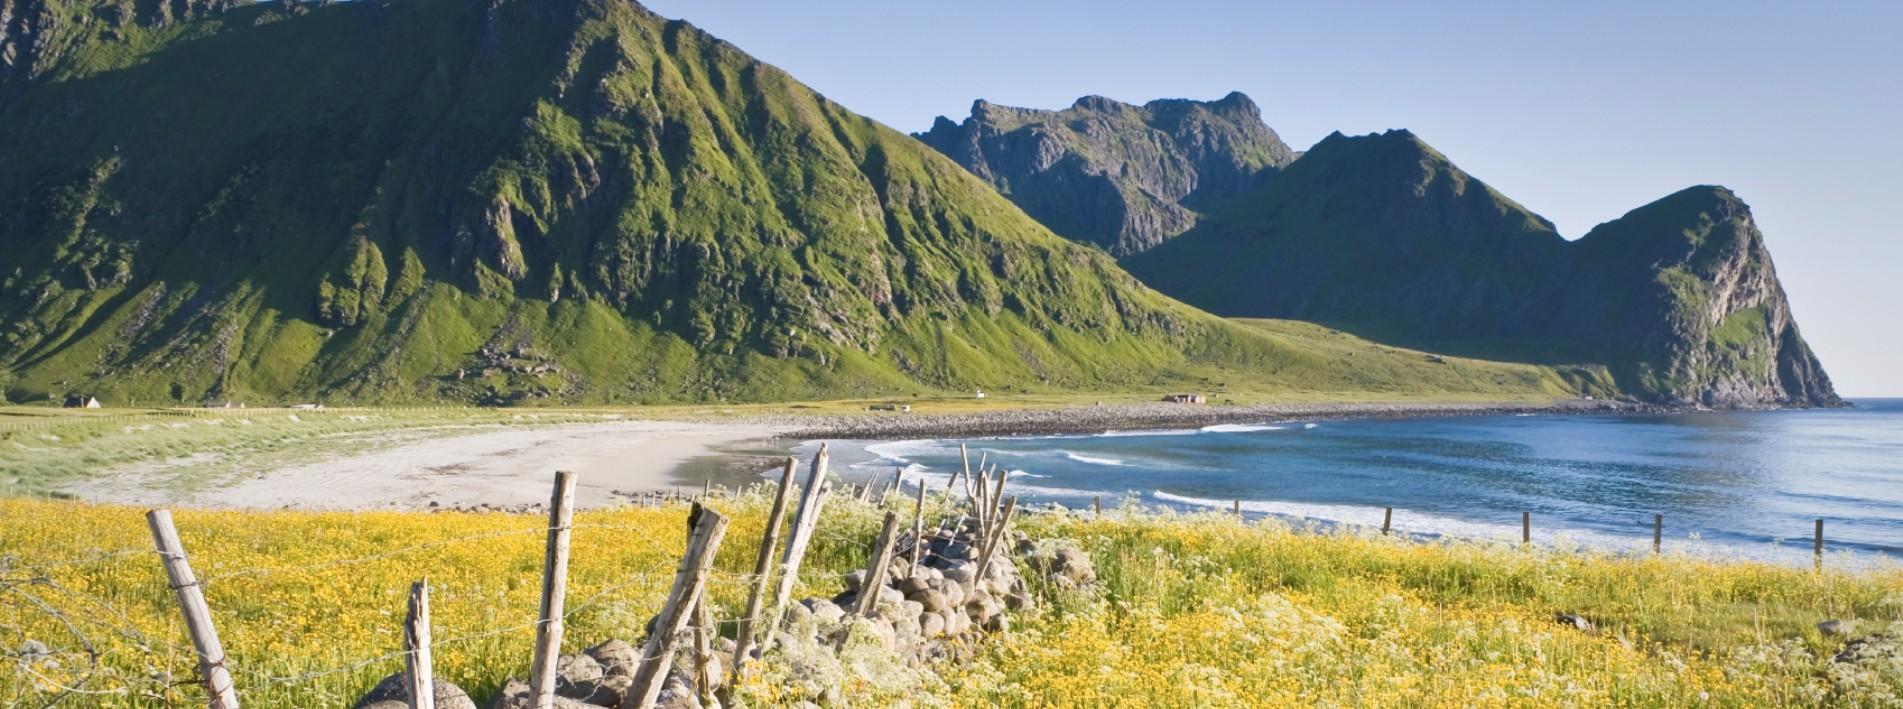 Strand auf Lofoten